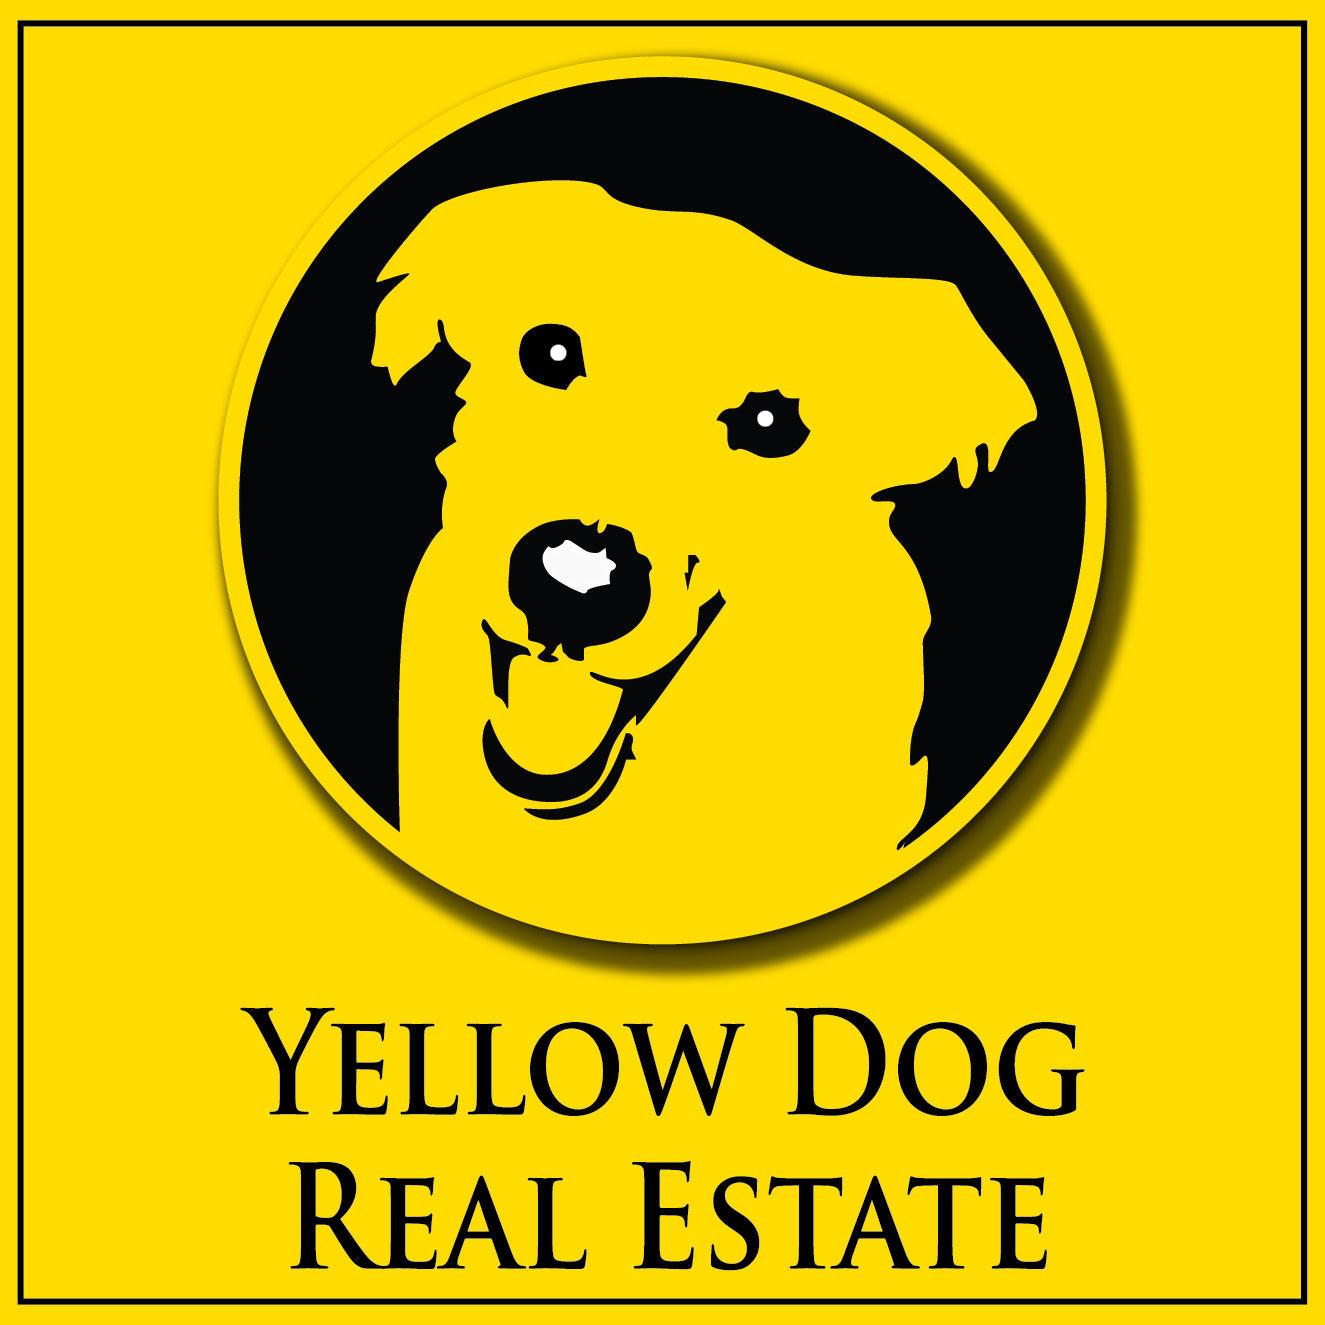 Yellow Dog Real Estate image 2